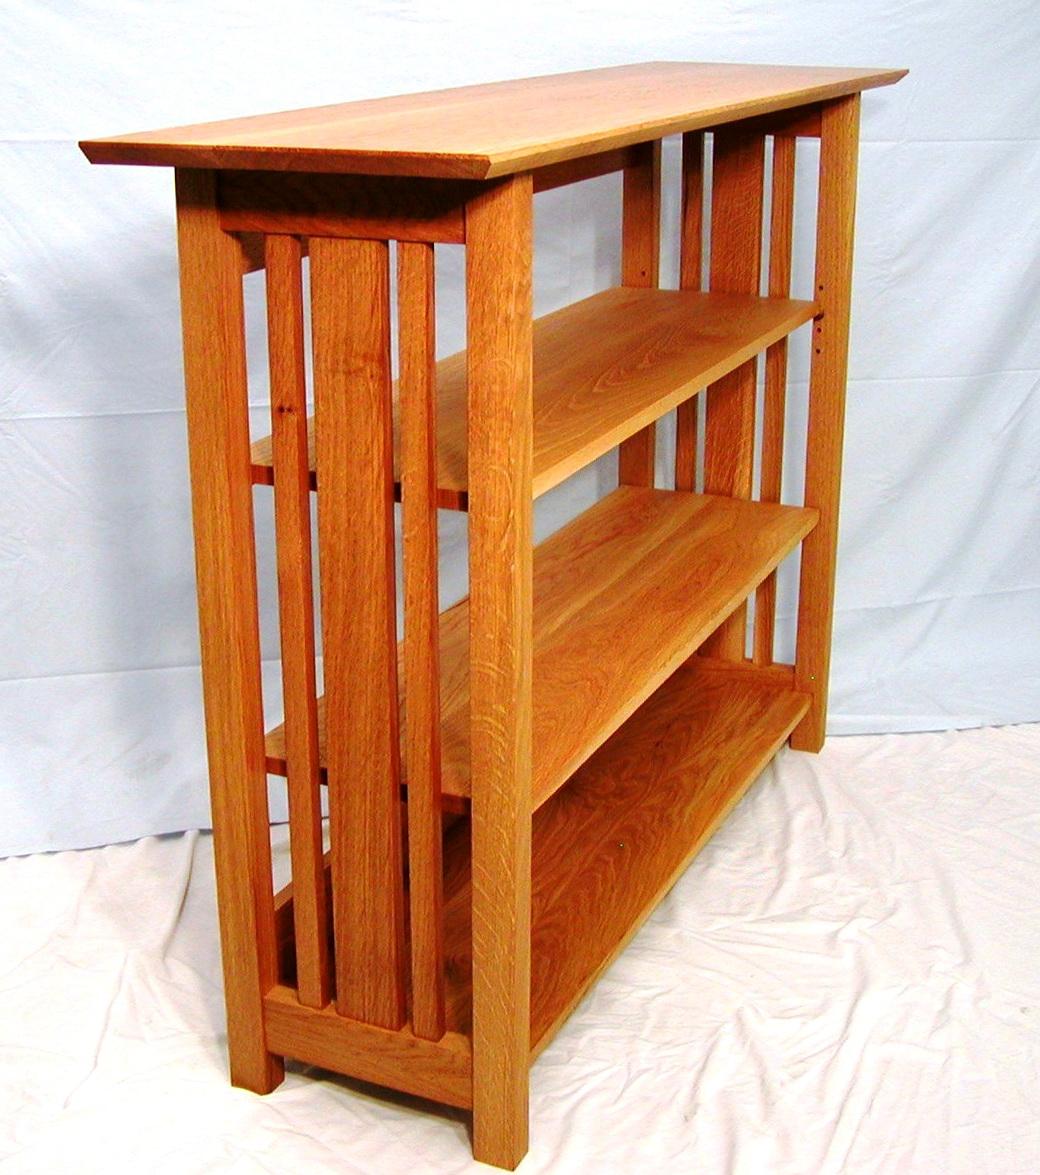 Mission Style Bookcase Plans